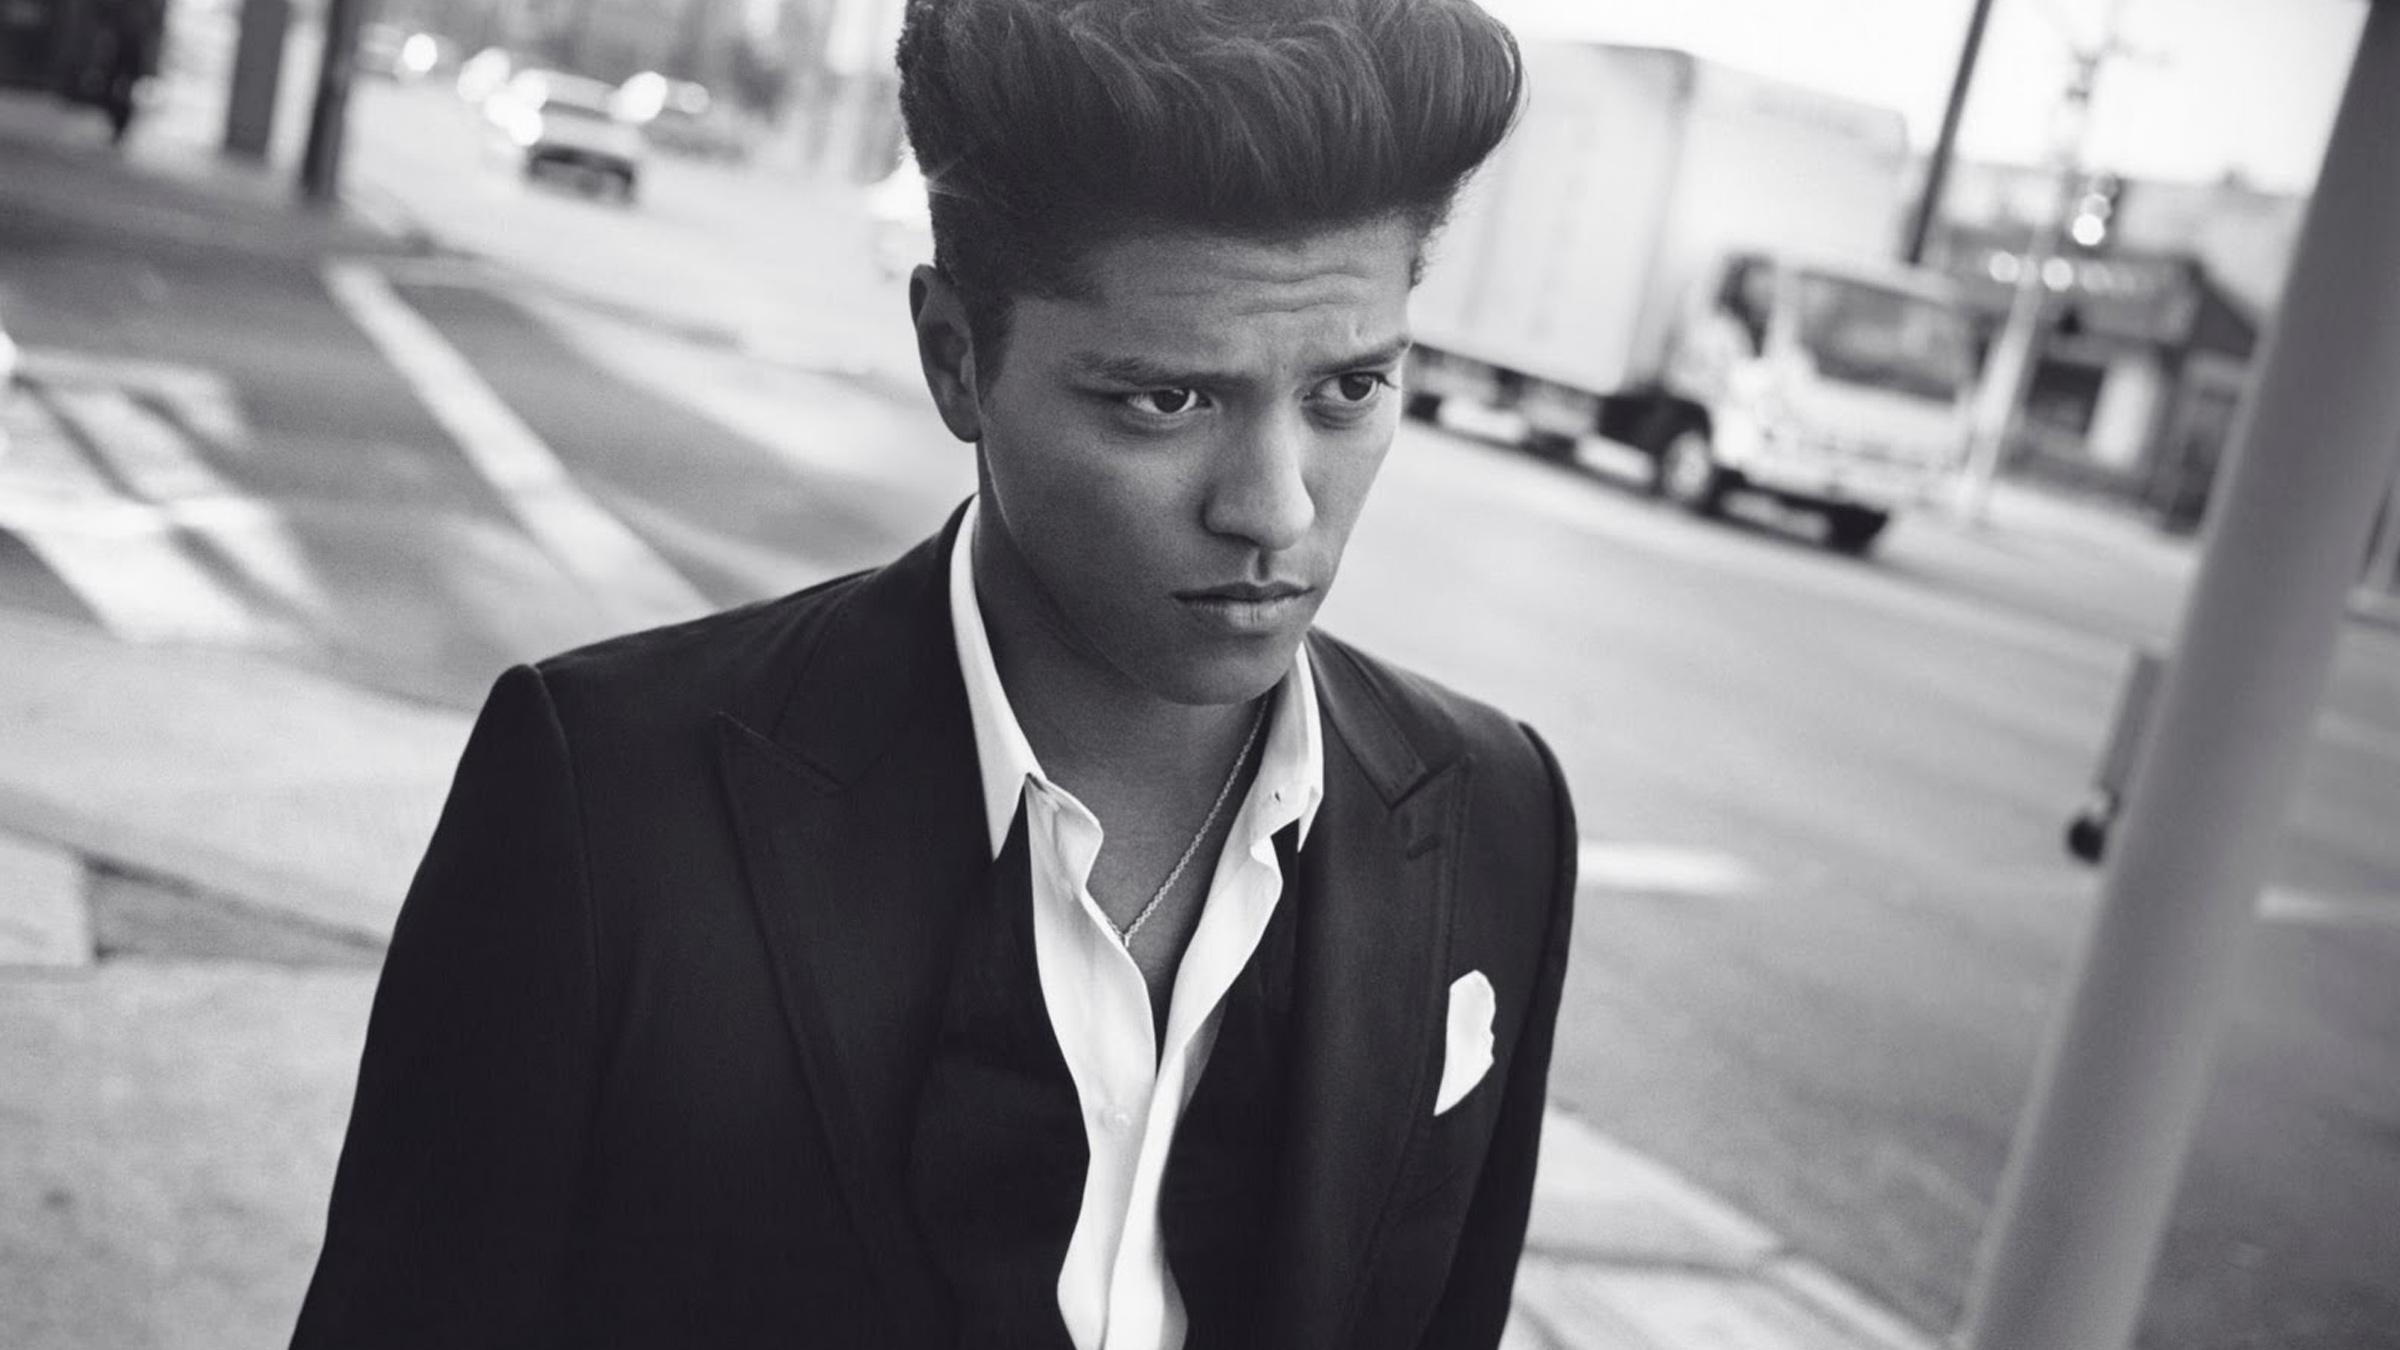 Bruno naakt teaser